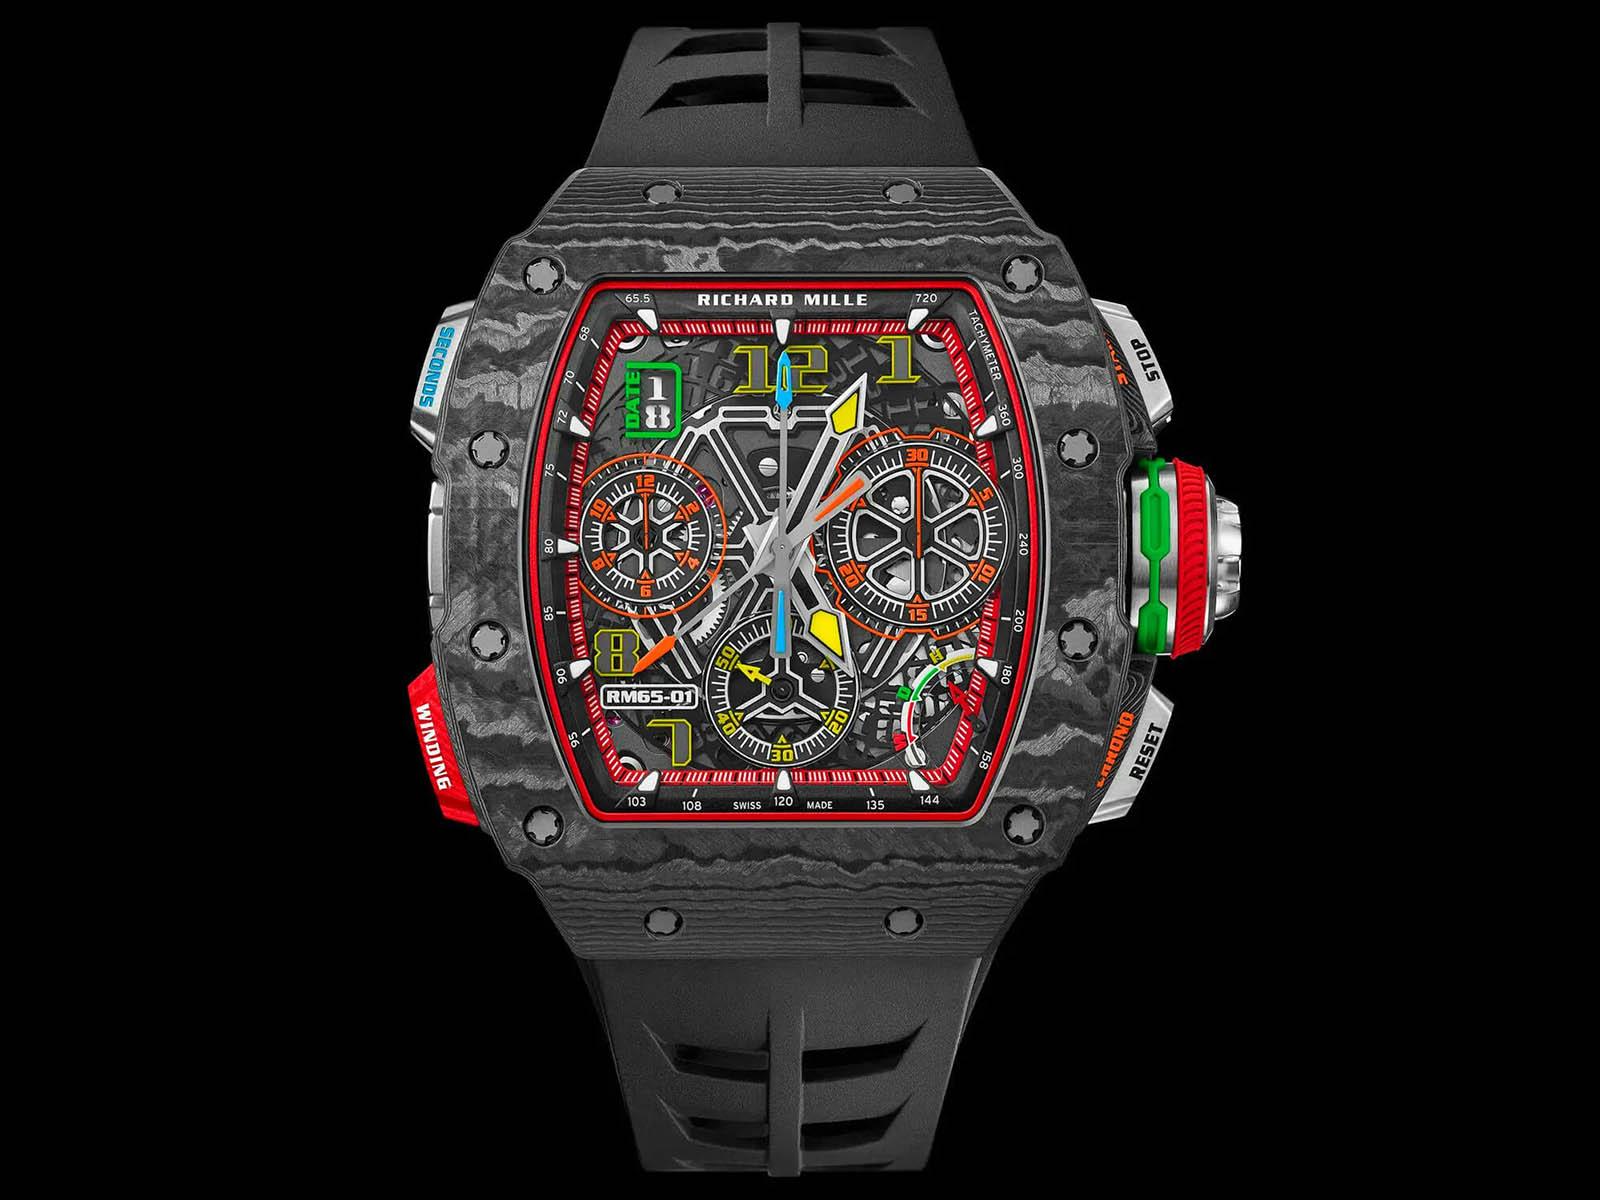 richard-mille-rm-65-01-automatic-split-seconds-chronograph-2.jpg